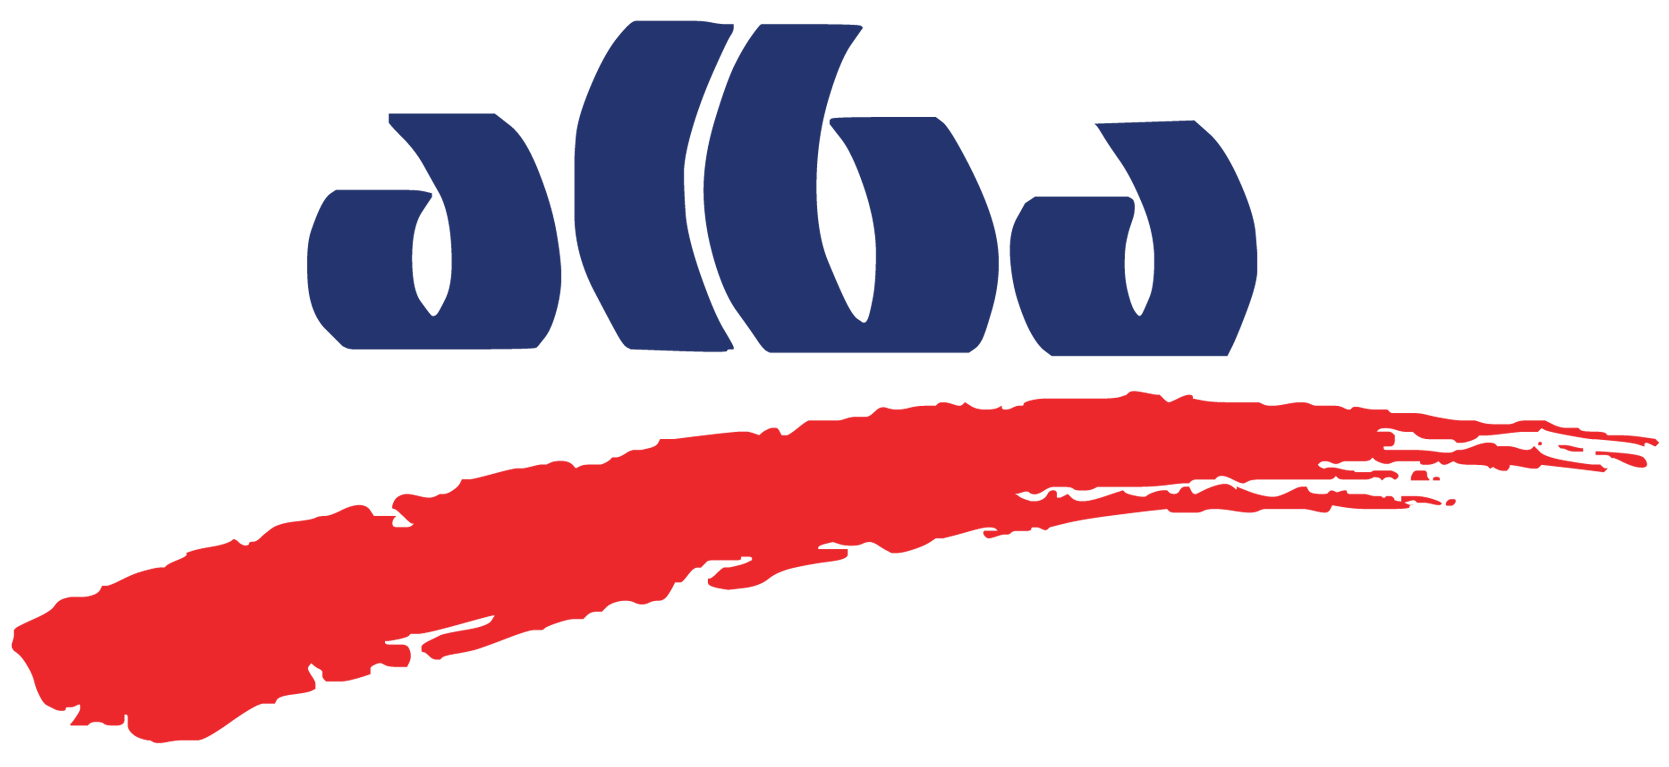 Alba Competitors, Revenue and Employees - Owler Company Profile